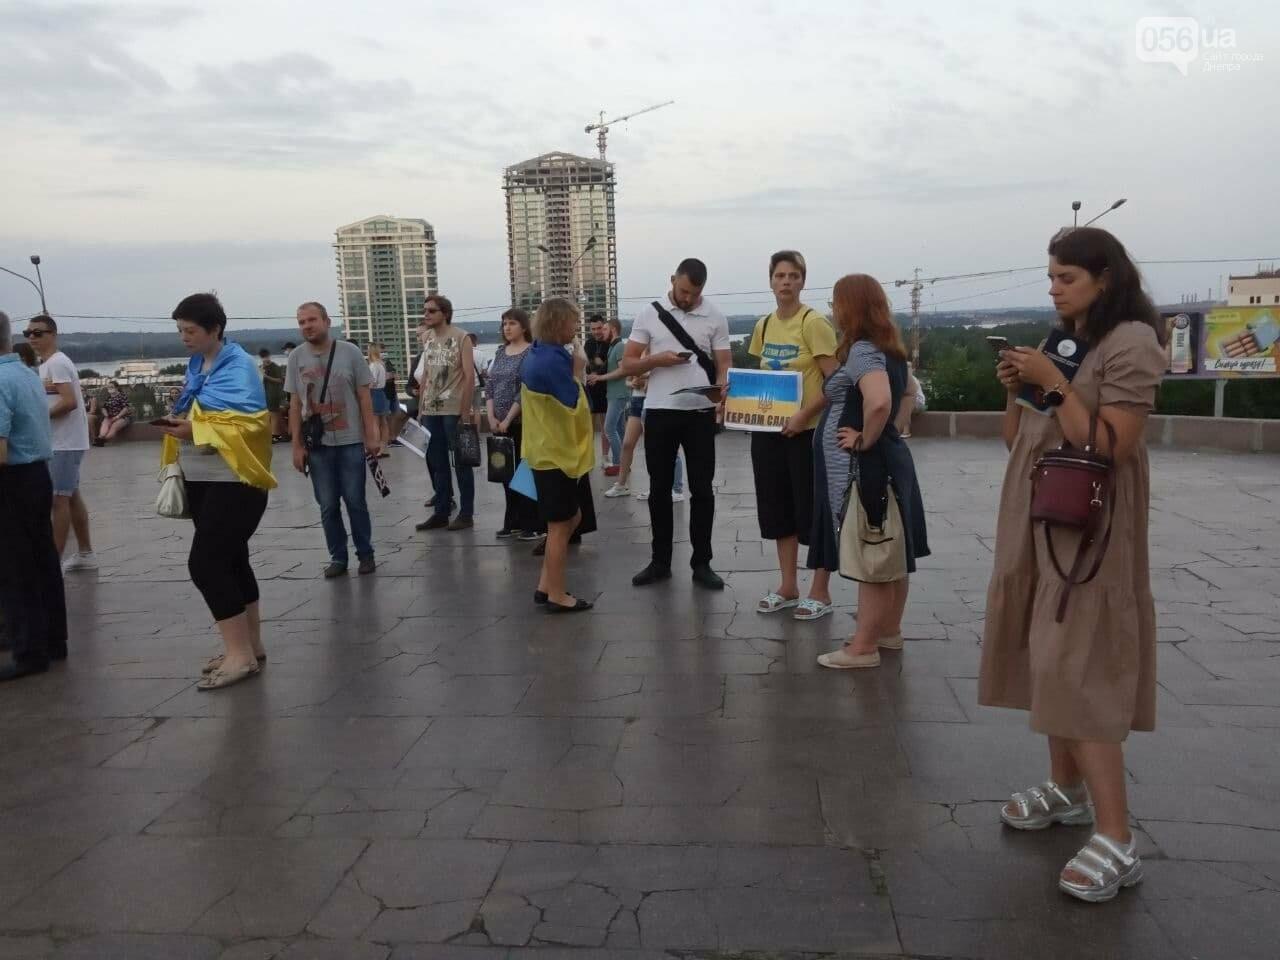 В Днепре активисты заявили, что победят Путина, - ФОТО, ВИДЕО, фото-16